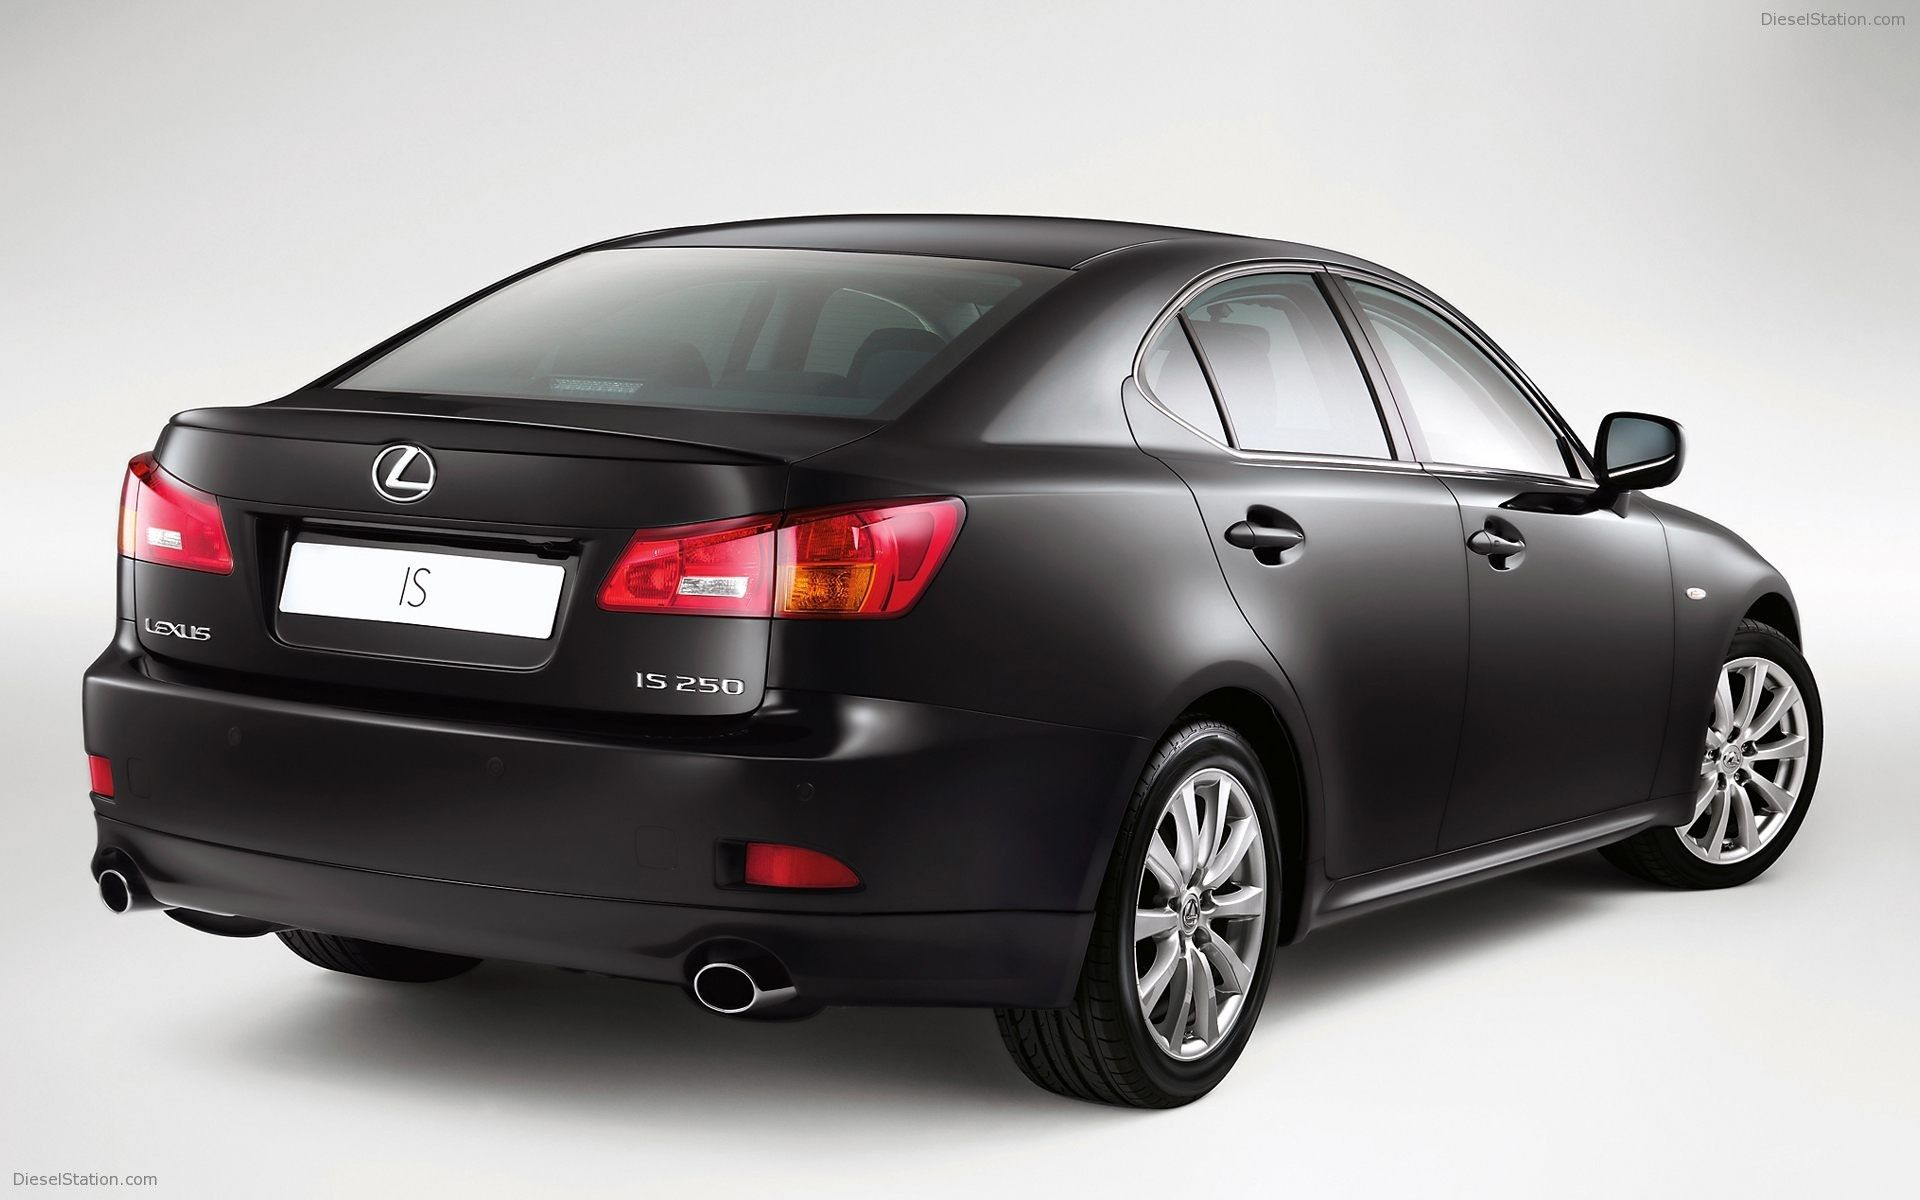 Lexus IS 250 SR Vehicles, Cars, Car